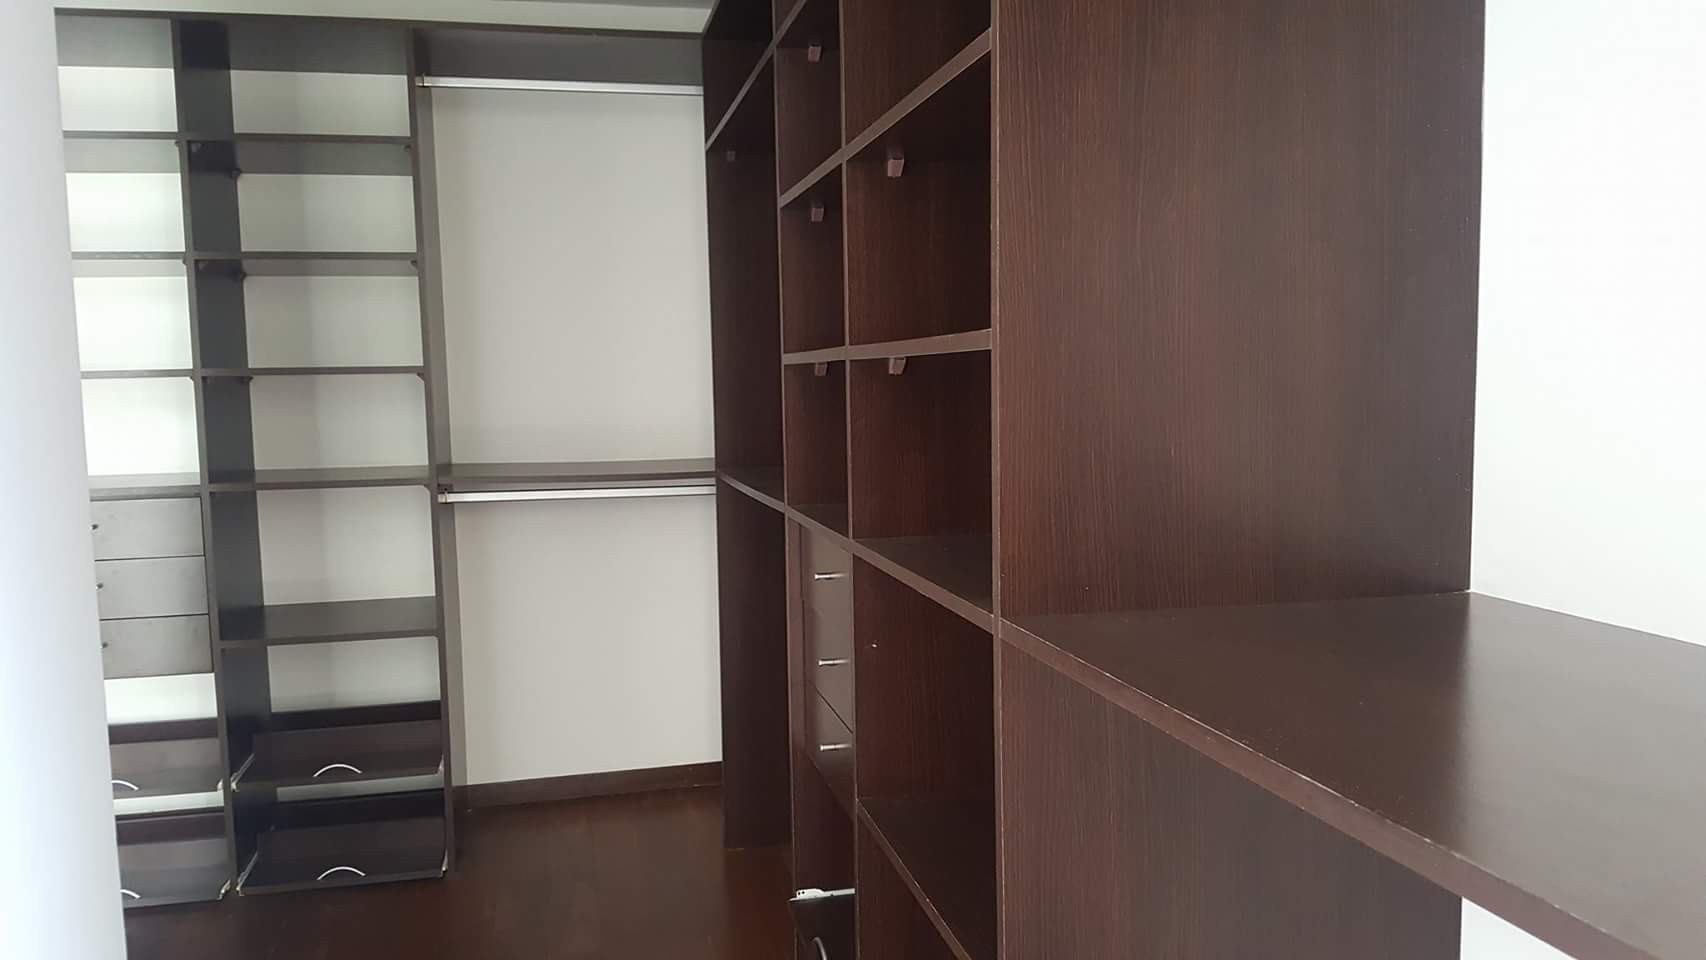 Departamento en Venta ᗞᗴᑭᗩᖇᎢᗩᗰᗴᑎᎢᝪᗞᑌᑭᏞᗴ᙭(2ᔑᑌᏆᎢᗴᔑ)ᗴᑫᑌᏆᑭᗴᎢᖇᝪᏞ Foto 3